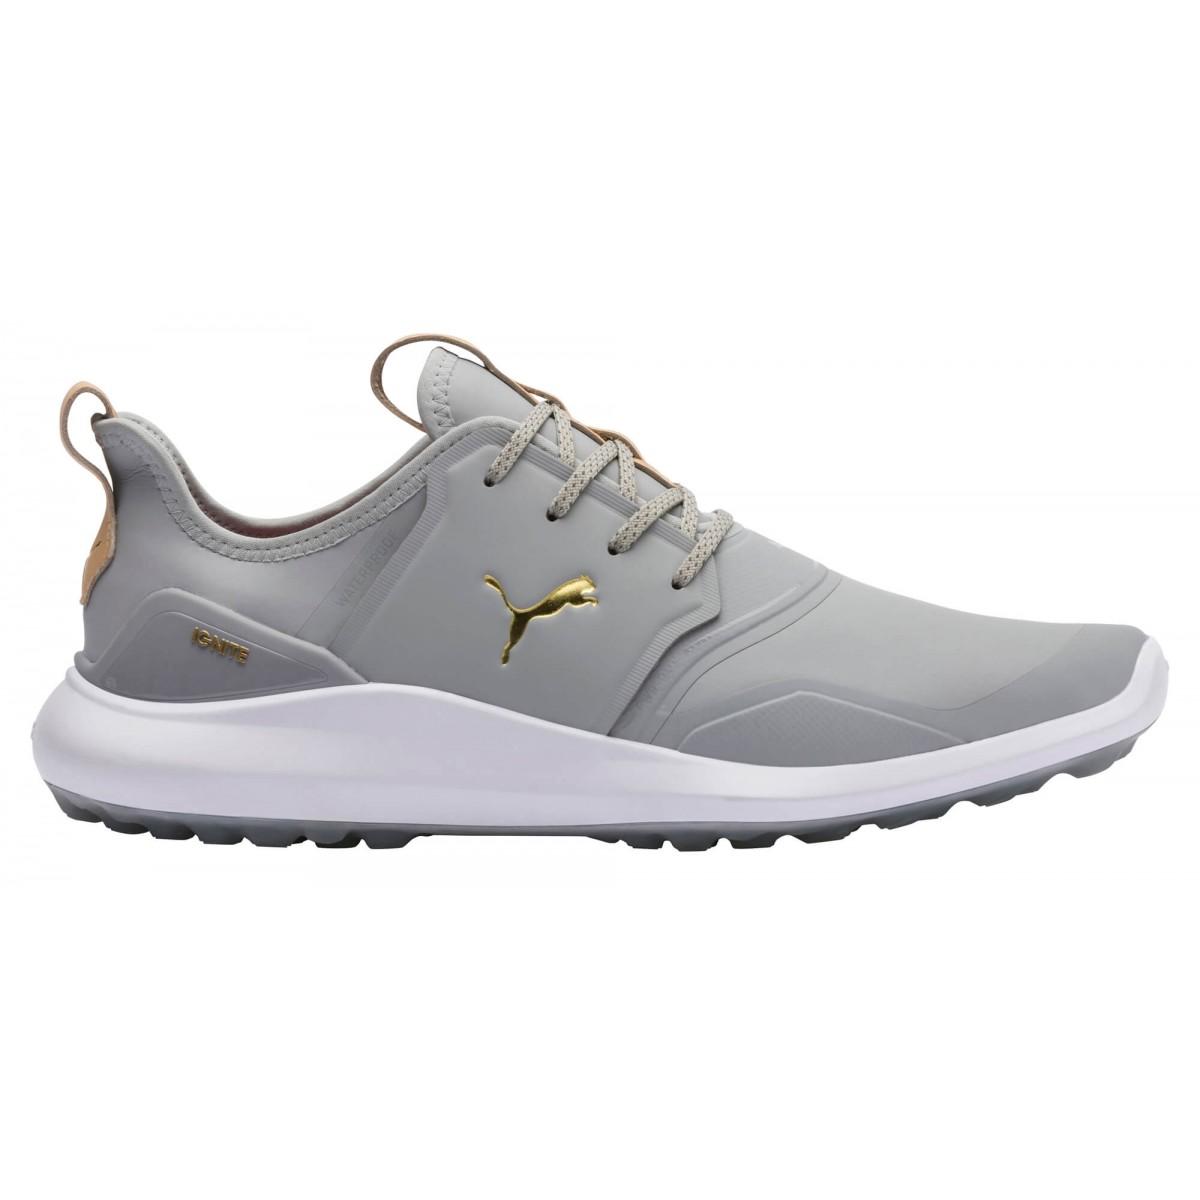 puma shoes latest model